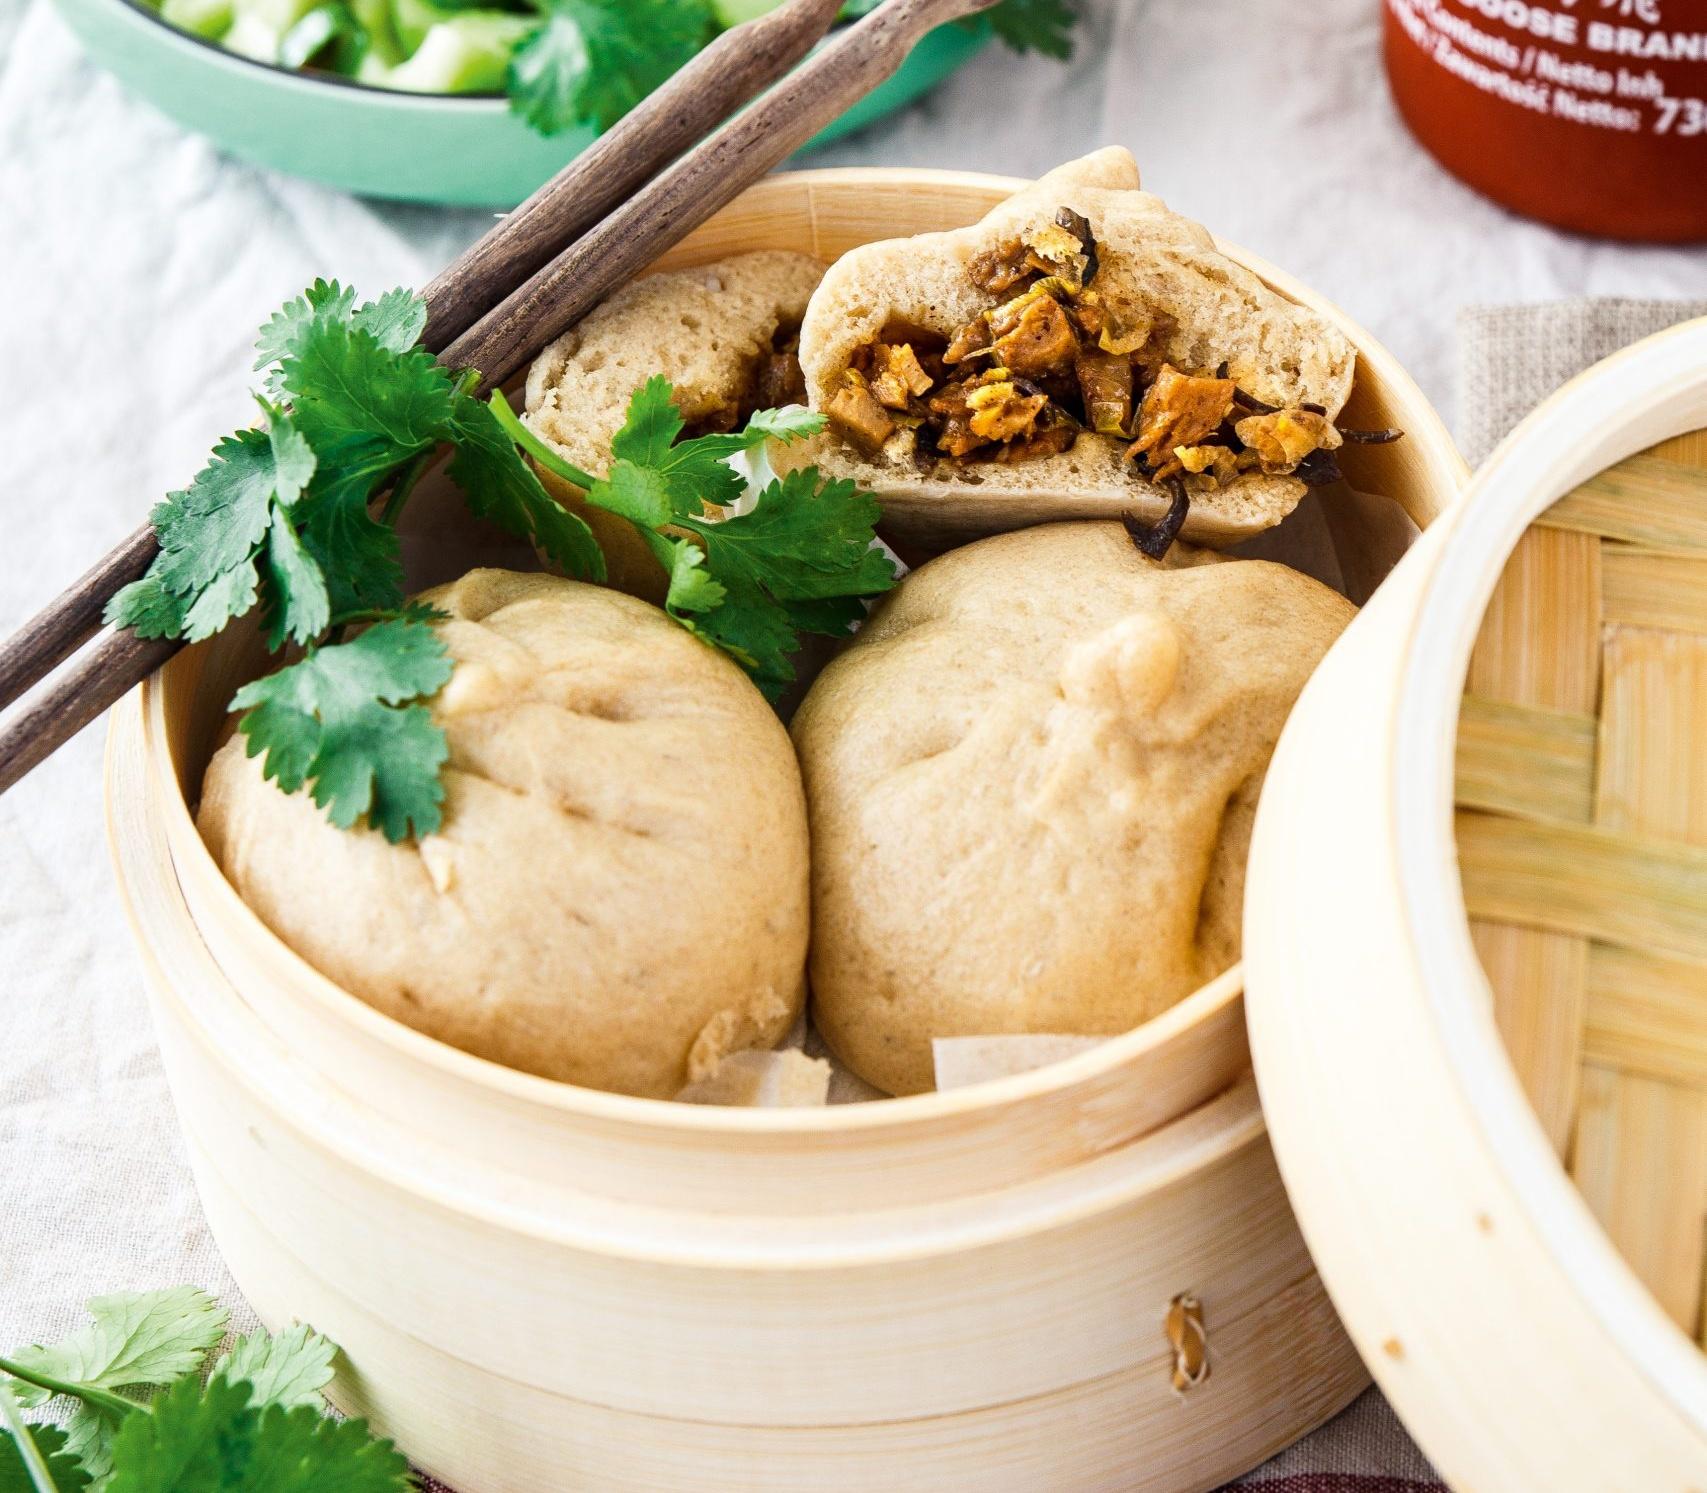 Five Spice Baozi Delicious Steamed Buns